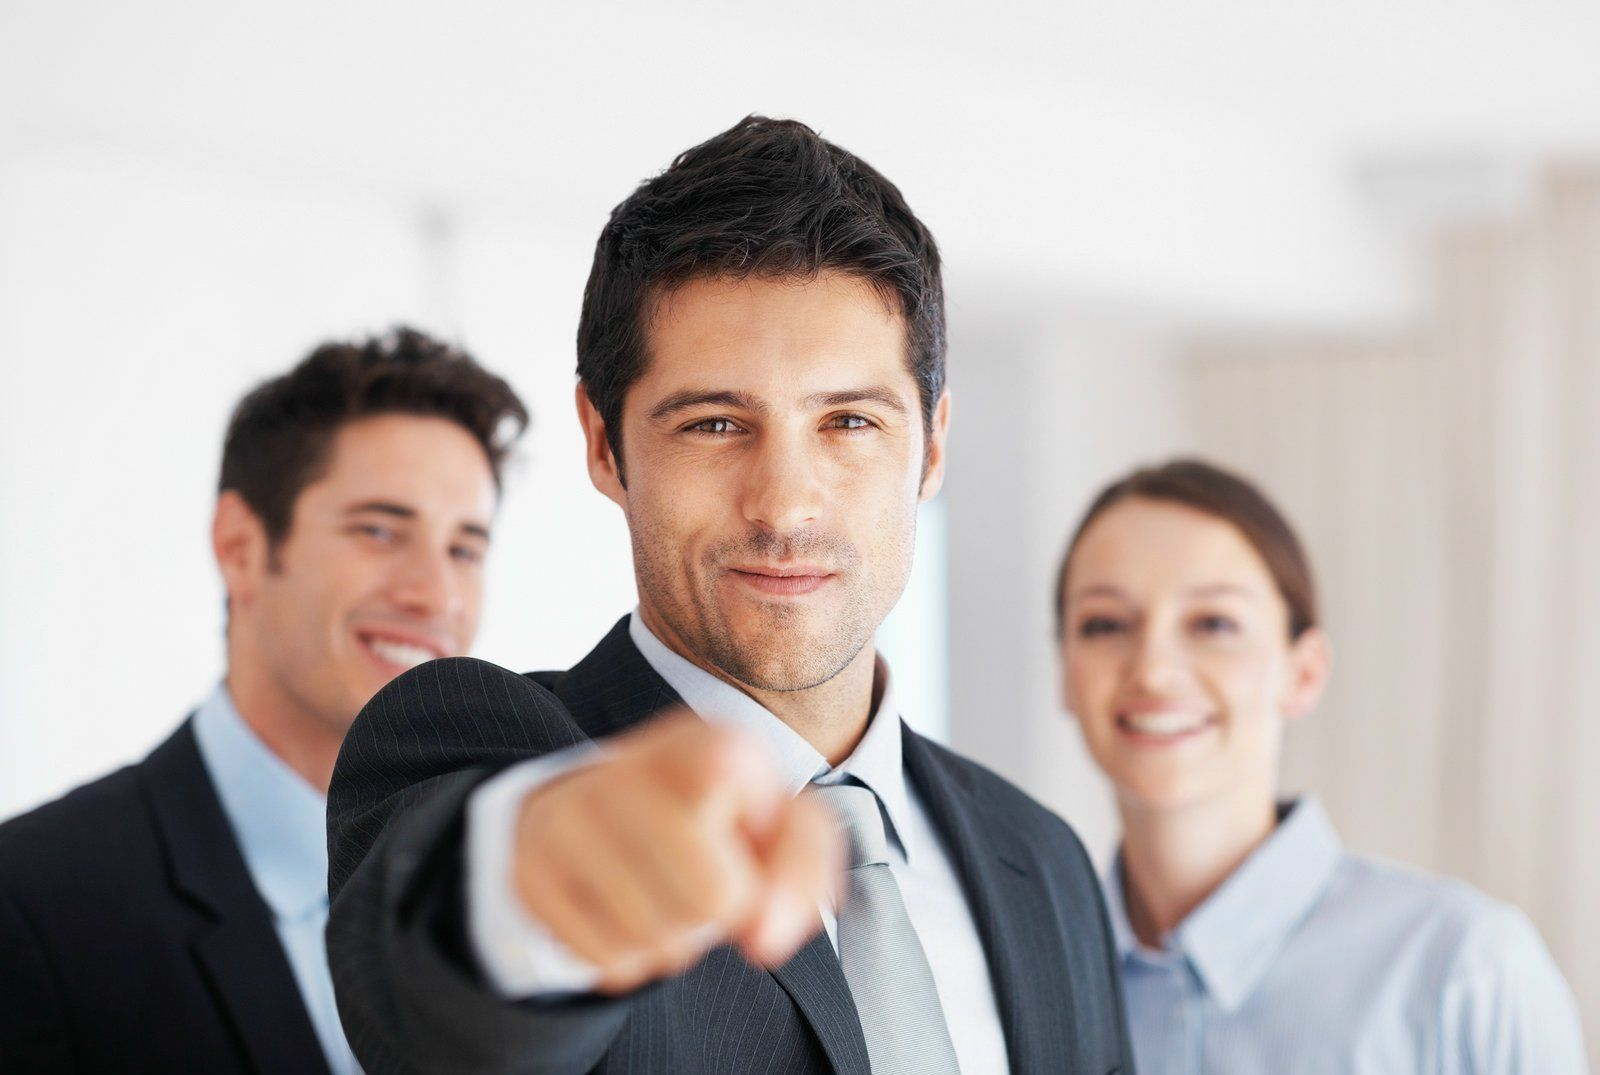 Digital Marketing: Creating An Awe Inspiring Experience For The Target Market